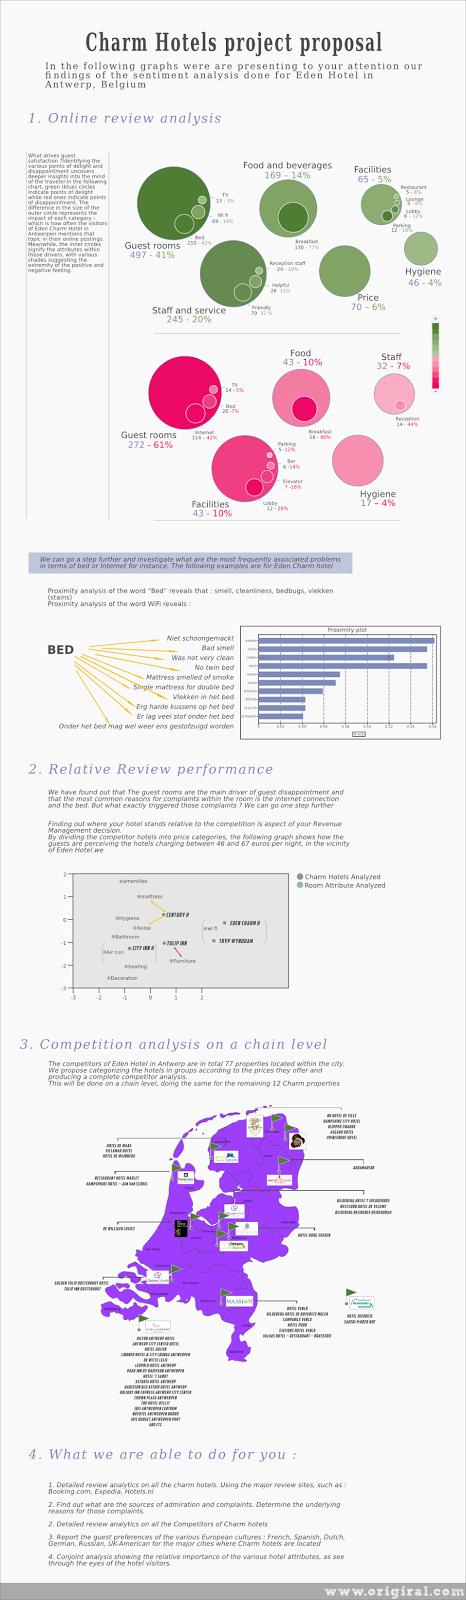 инфографика хотели в Белгия